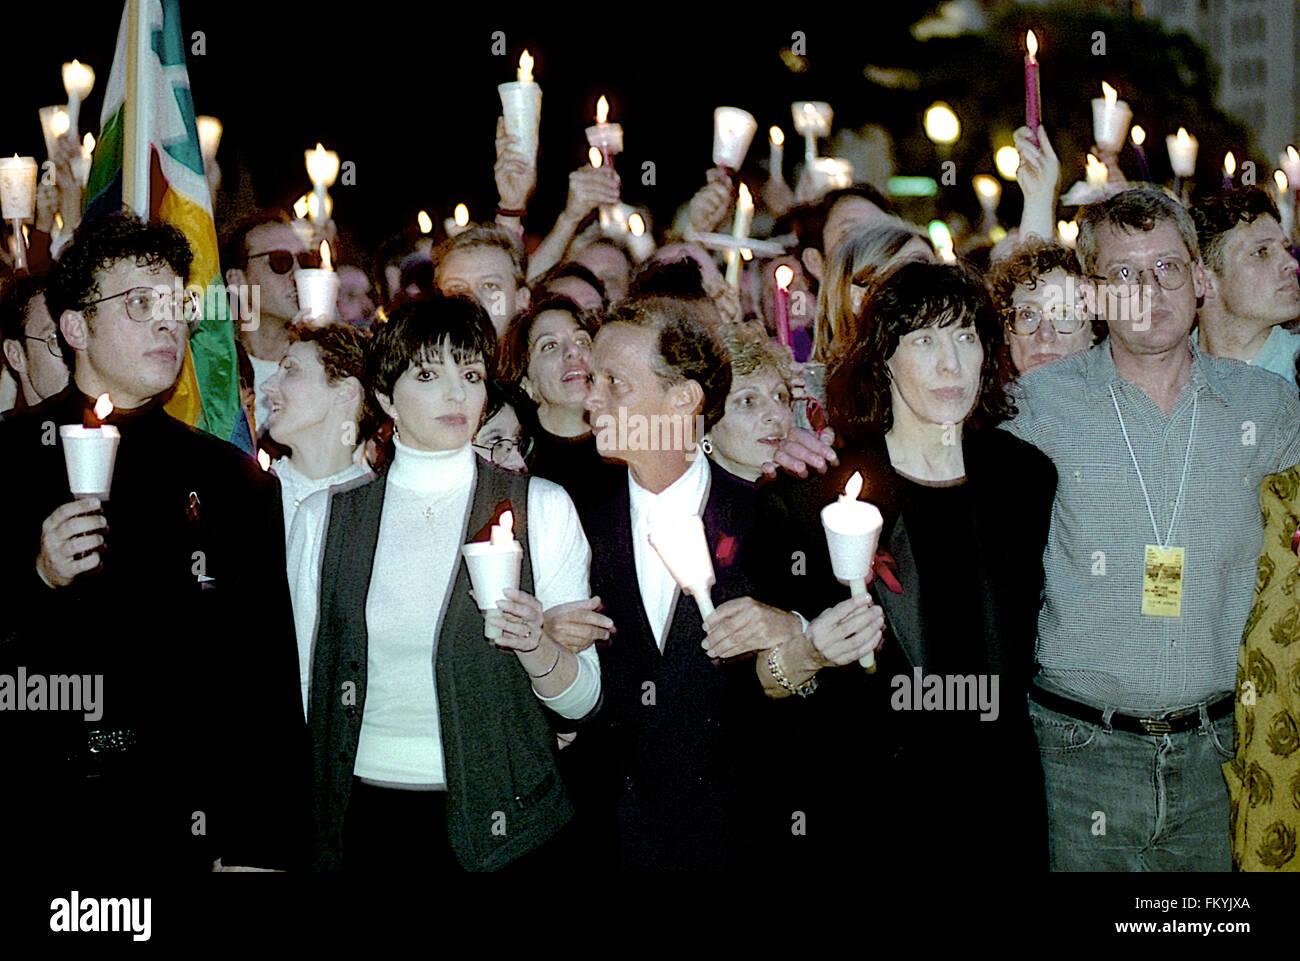 Washington, DC., USA 10th October, 1992 Liza Minnelli, Joey Gray, Patti Austin, Lily Tomlin, Cleve Jones march in - Stock Image